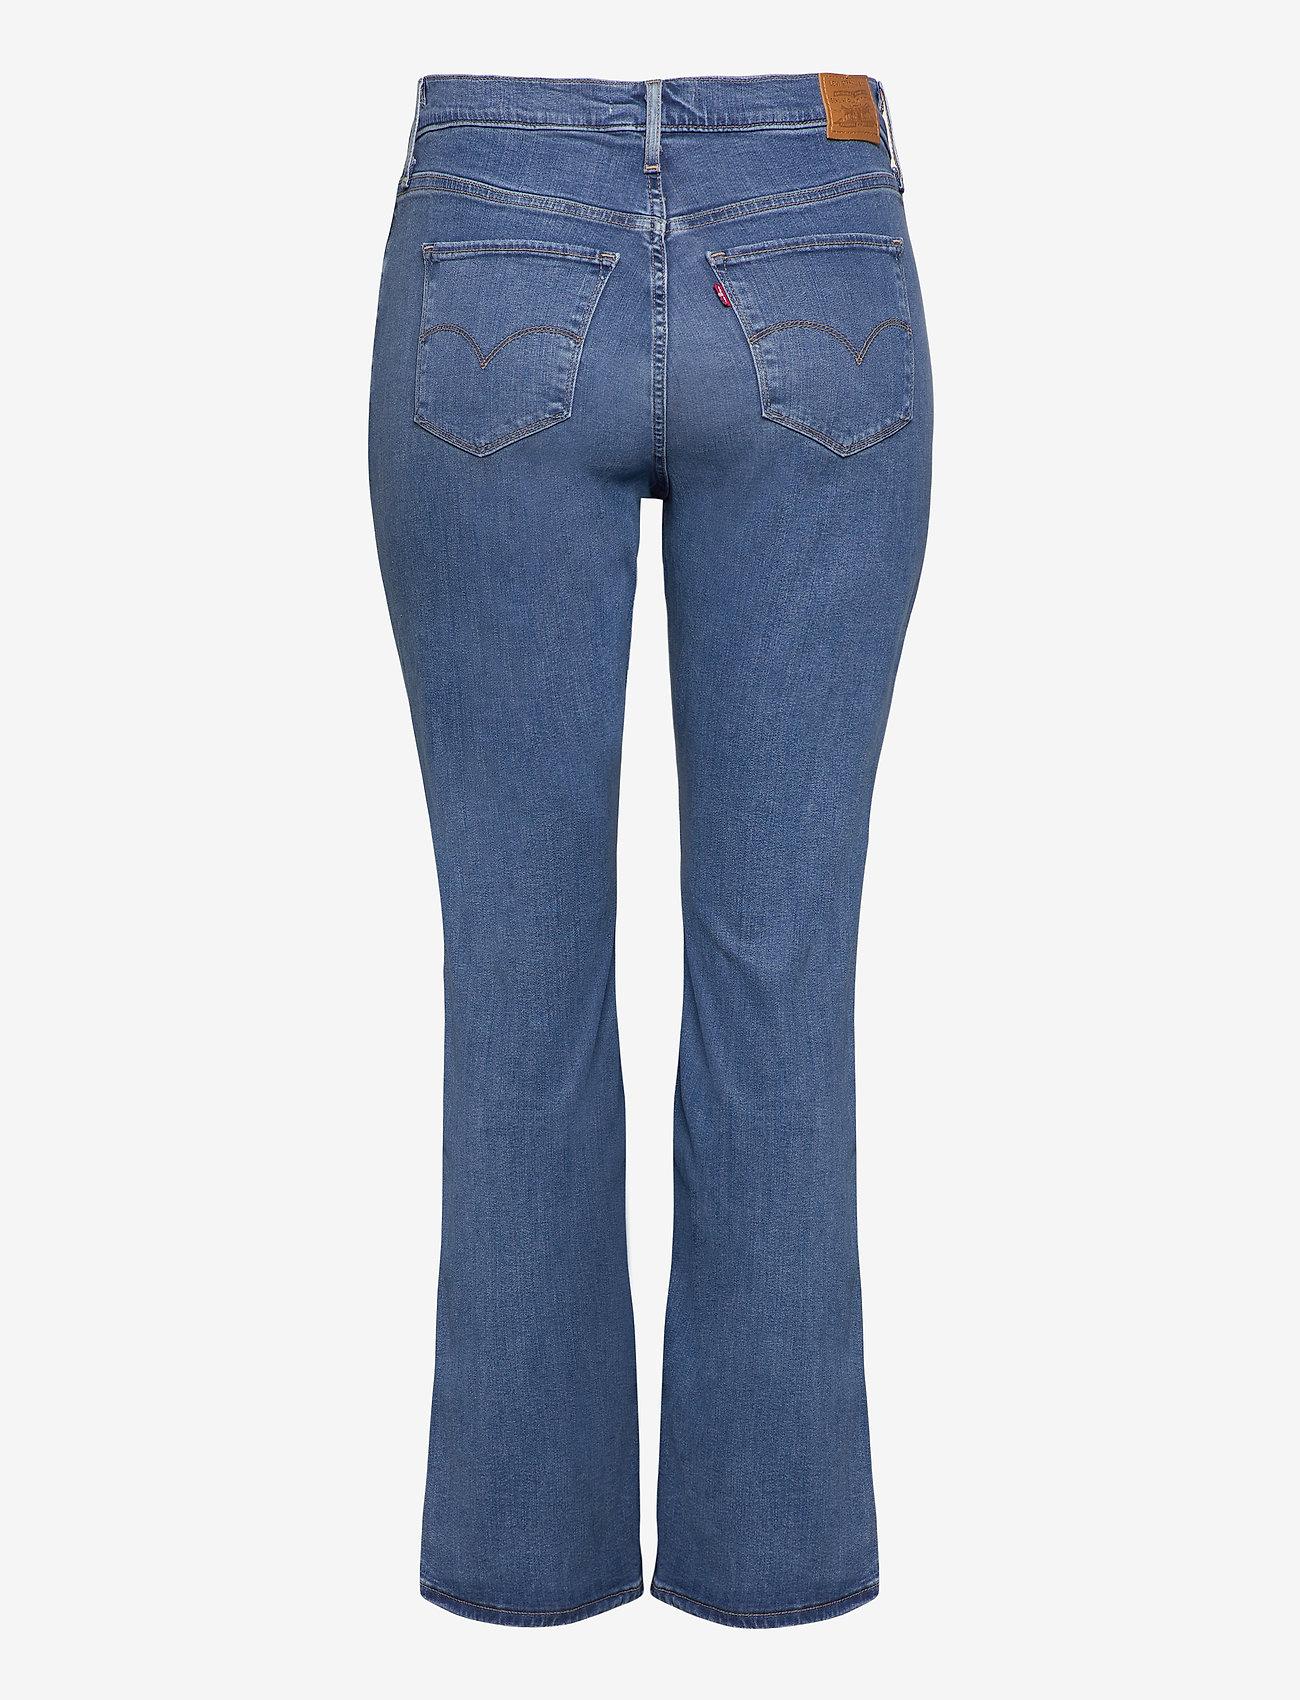 Levi's Plus Size - 725 PL HR BOOTCUT RIO RAVE PLU - bootcut jeans - light indigo - worn in - 1